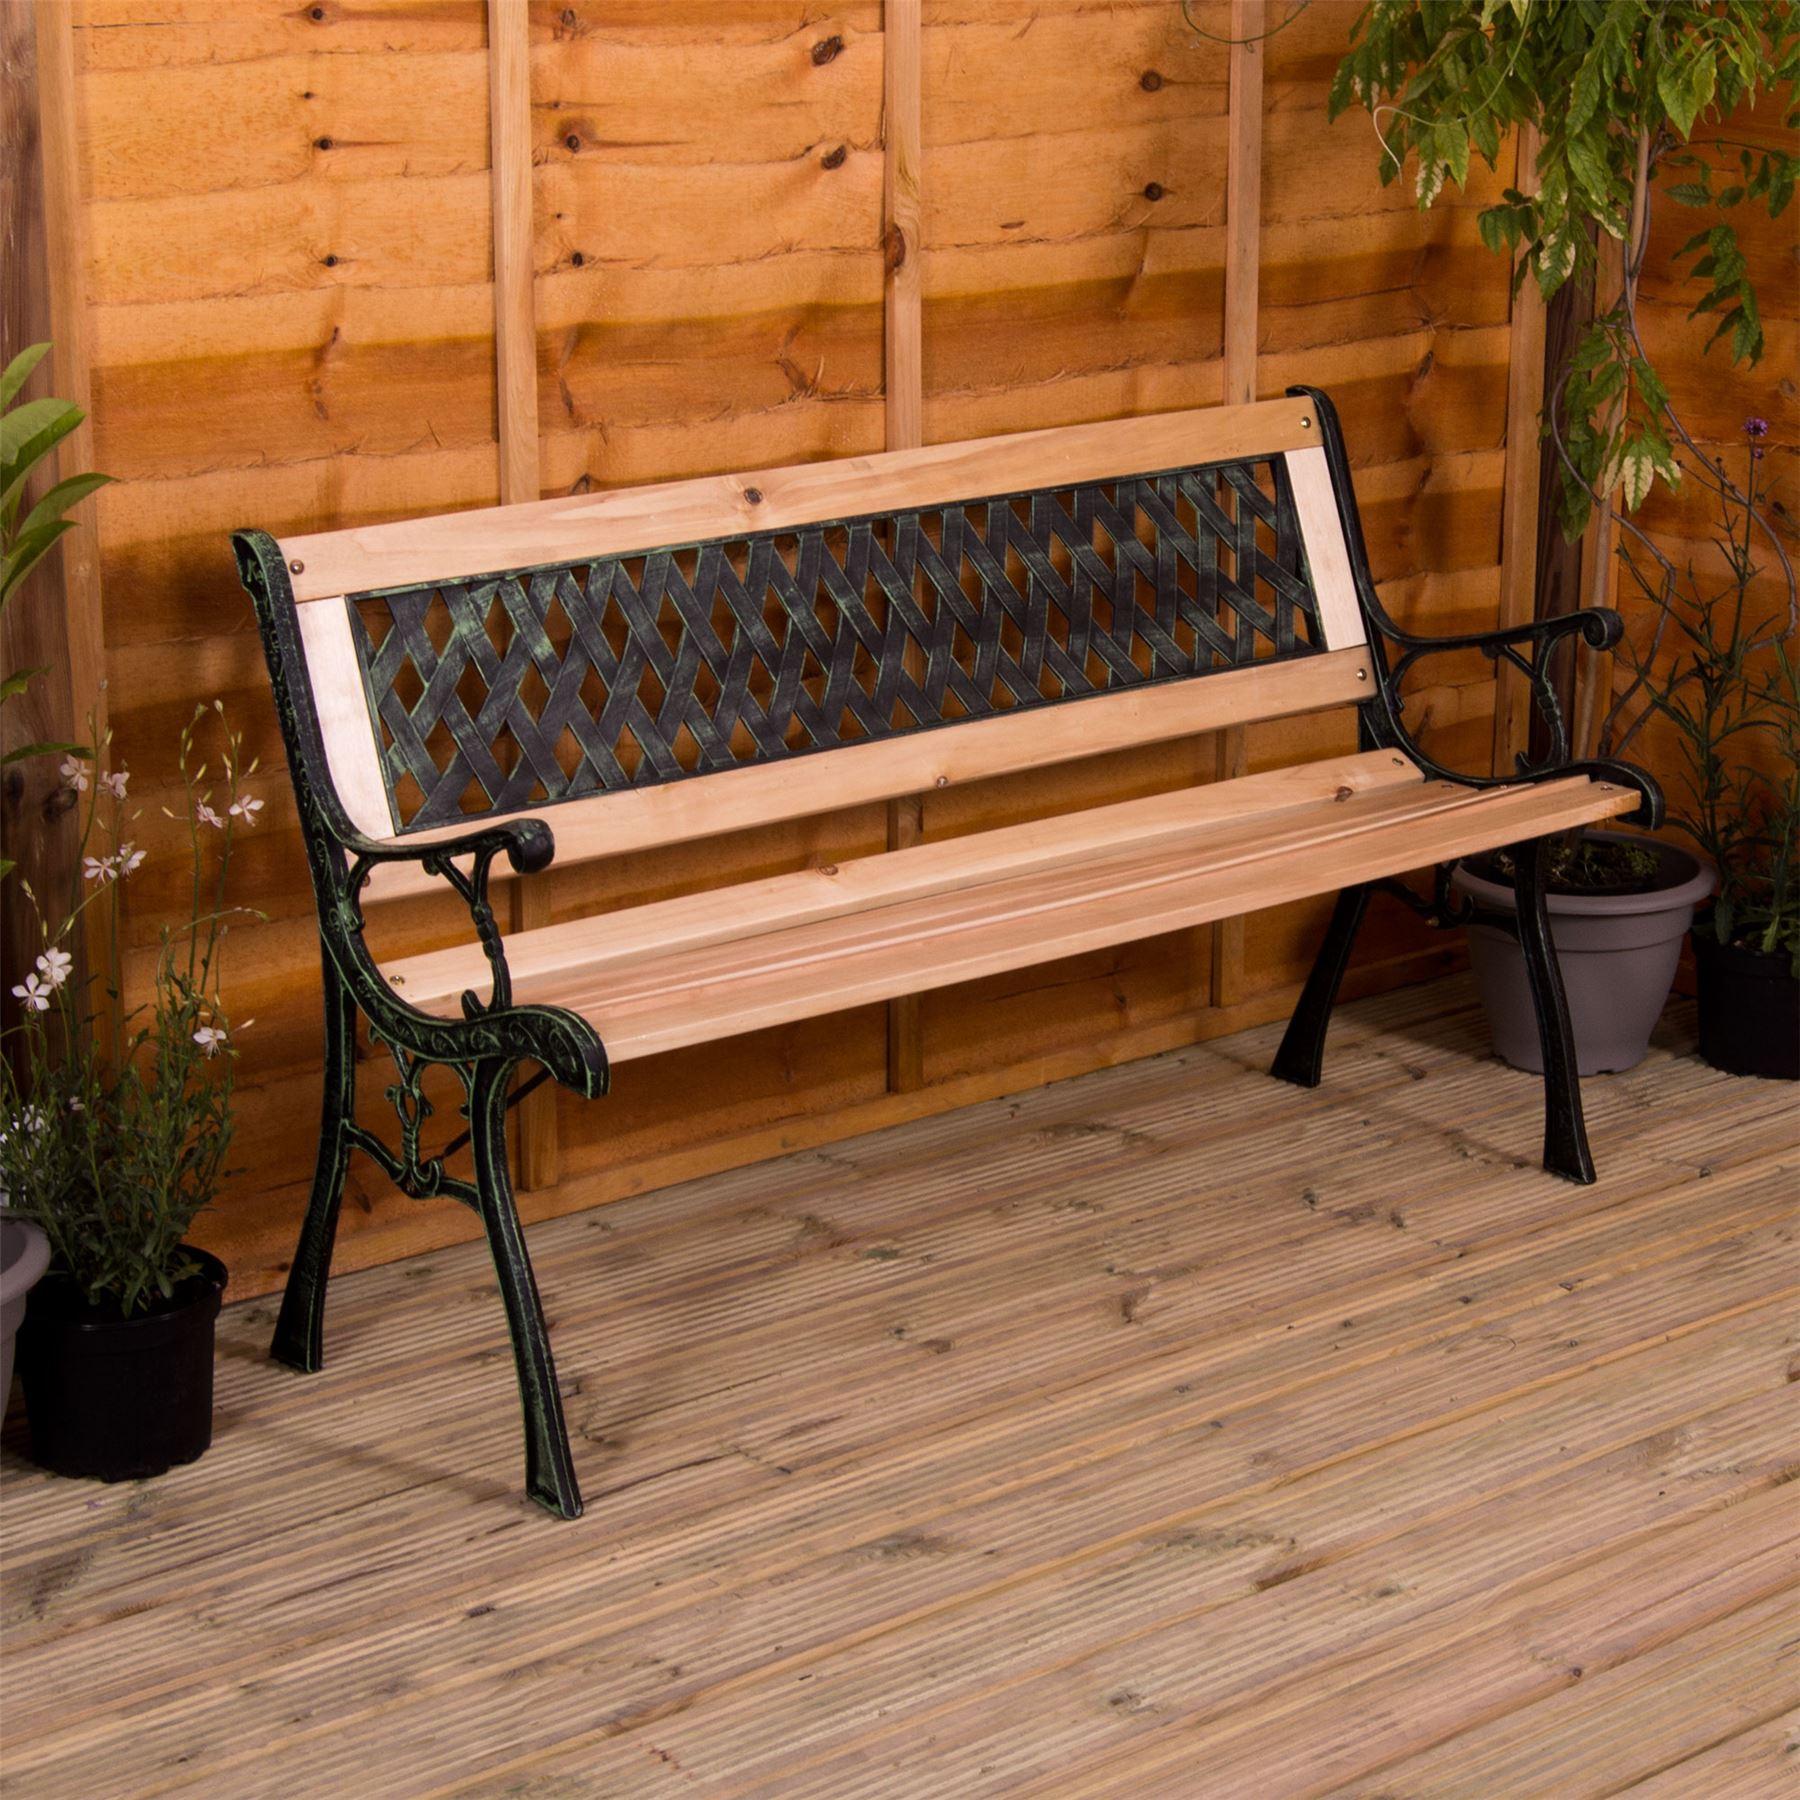 3 Seater Wooden Garden Bench (2 Designs) £27.60 delivered @ eBay homediscountltd